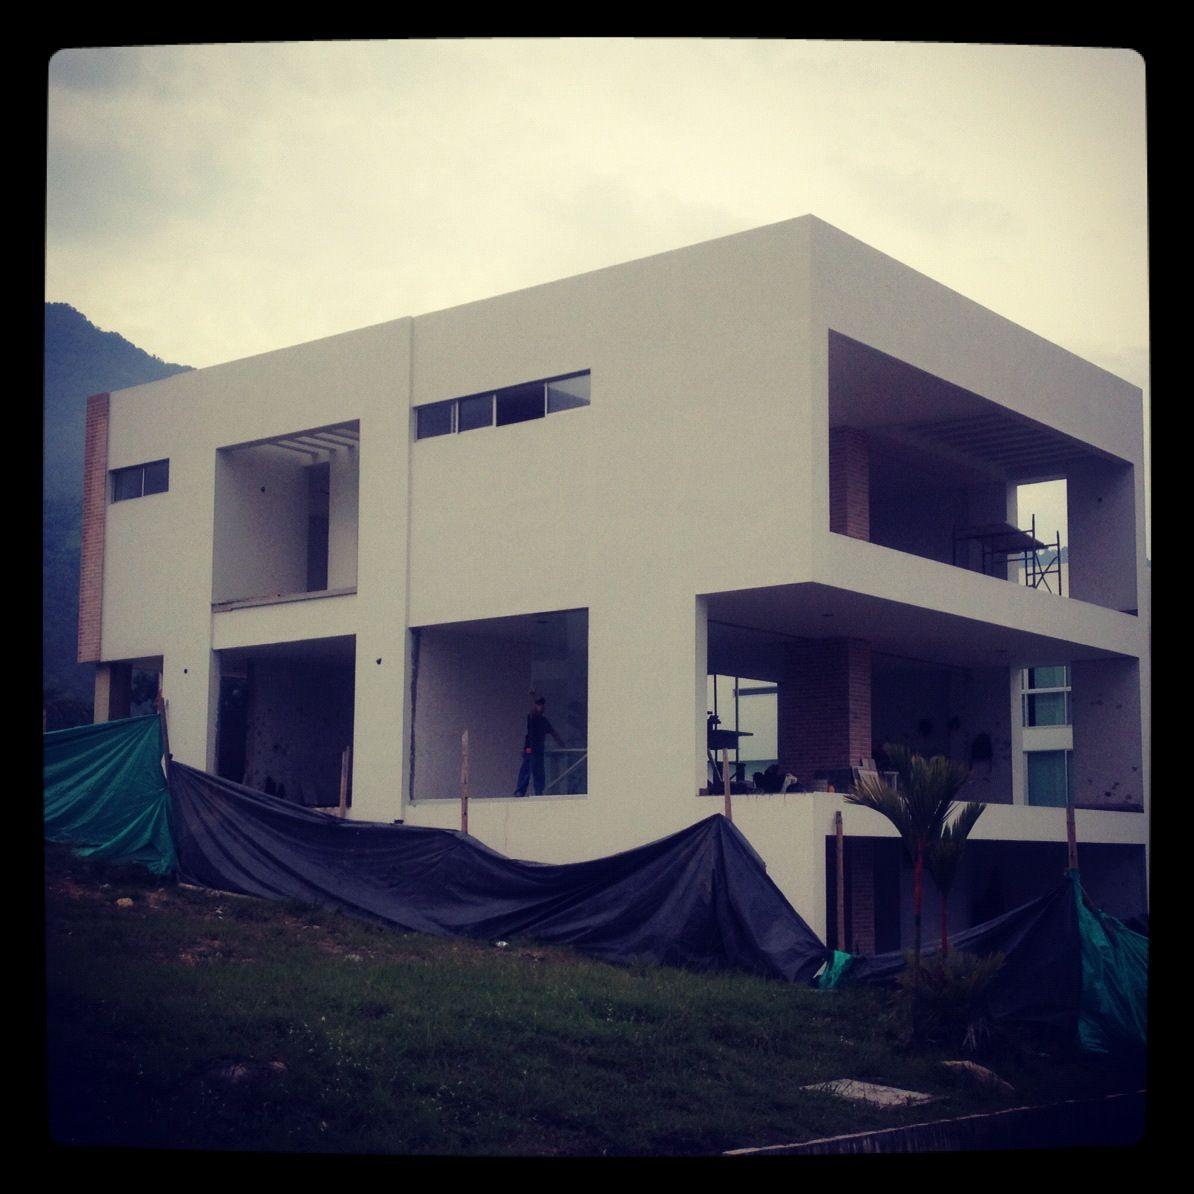 Casa cerro azul